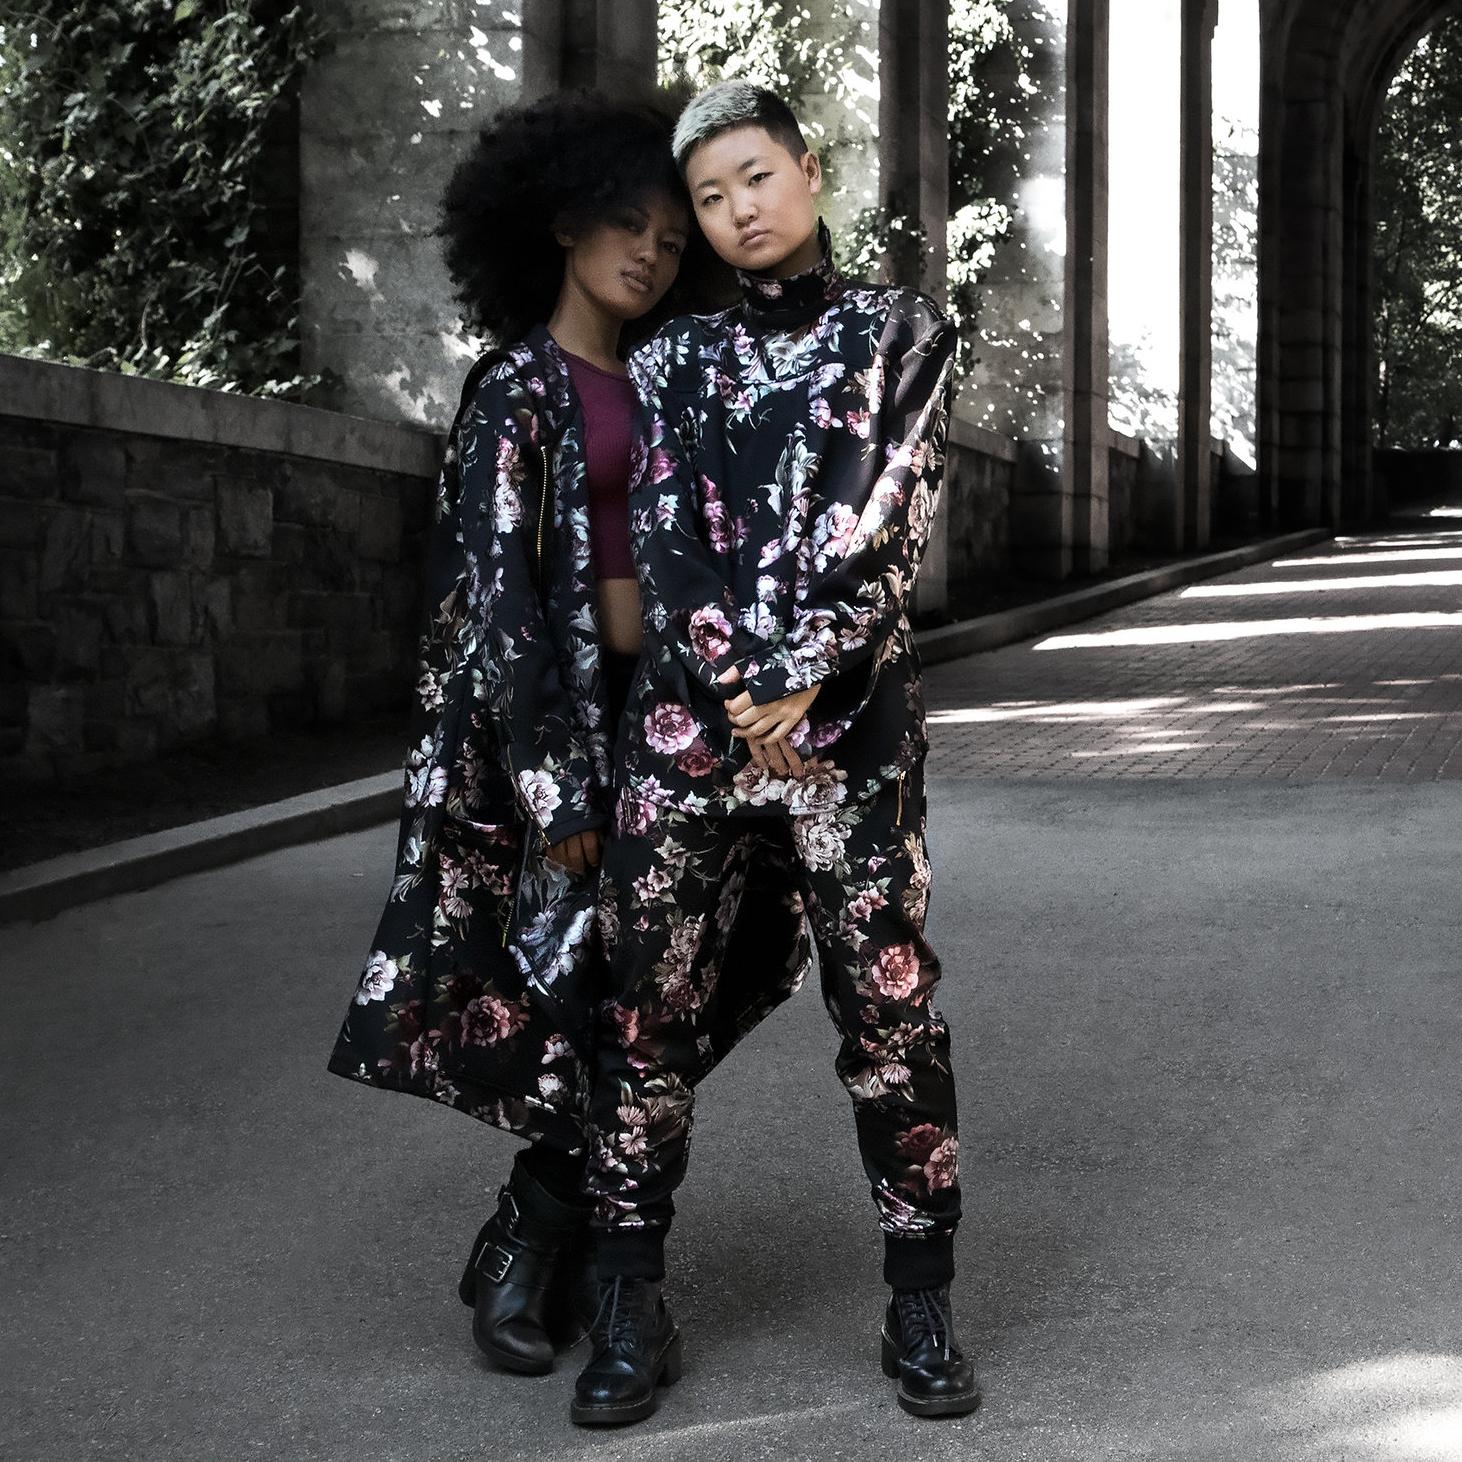 Stuzo Clothing   Photography shoot for Stuzo Clothing Lux Collection